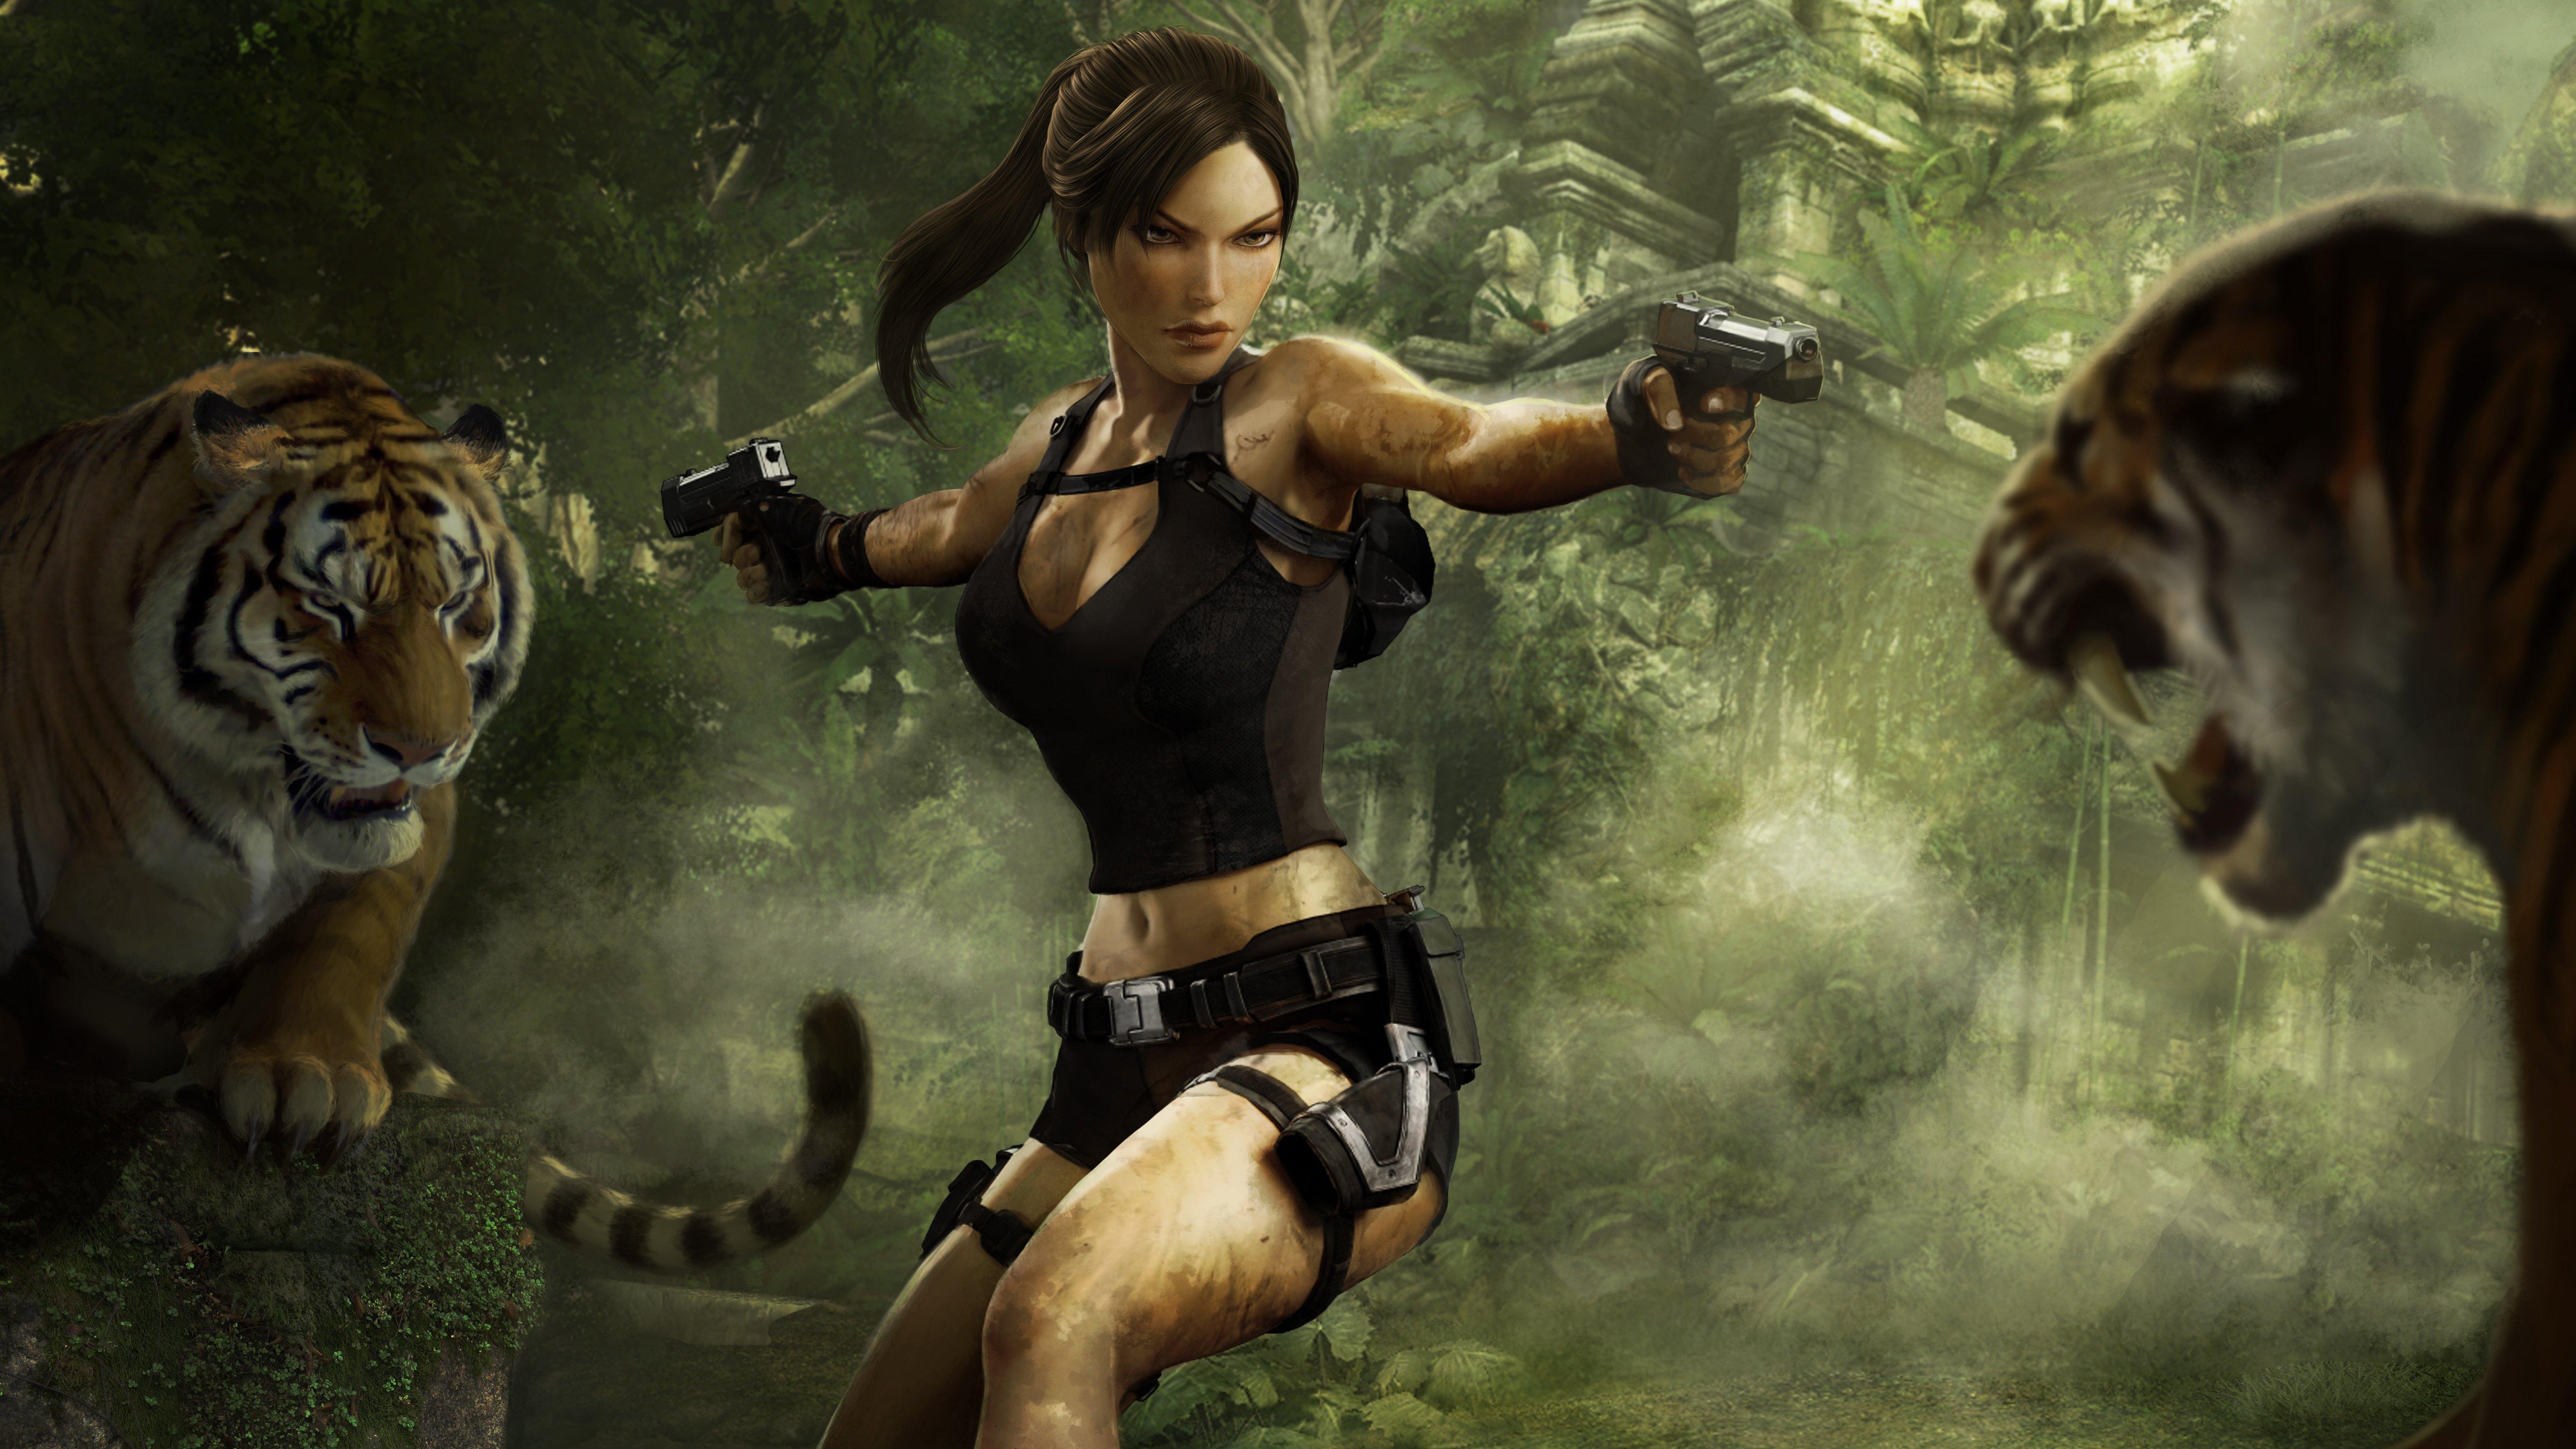 Fondos de pantalla Tomb Raider Underworld 2008